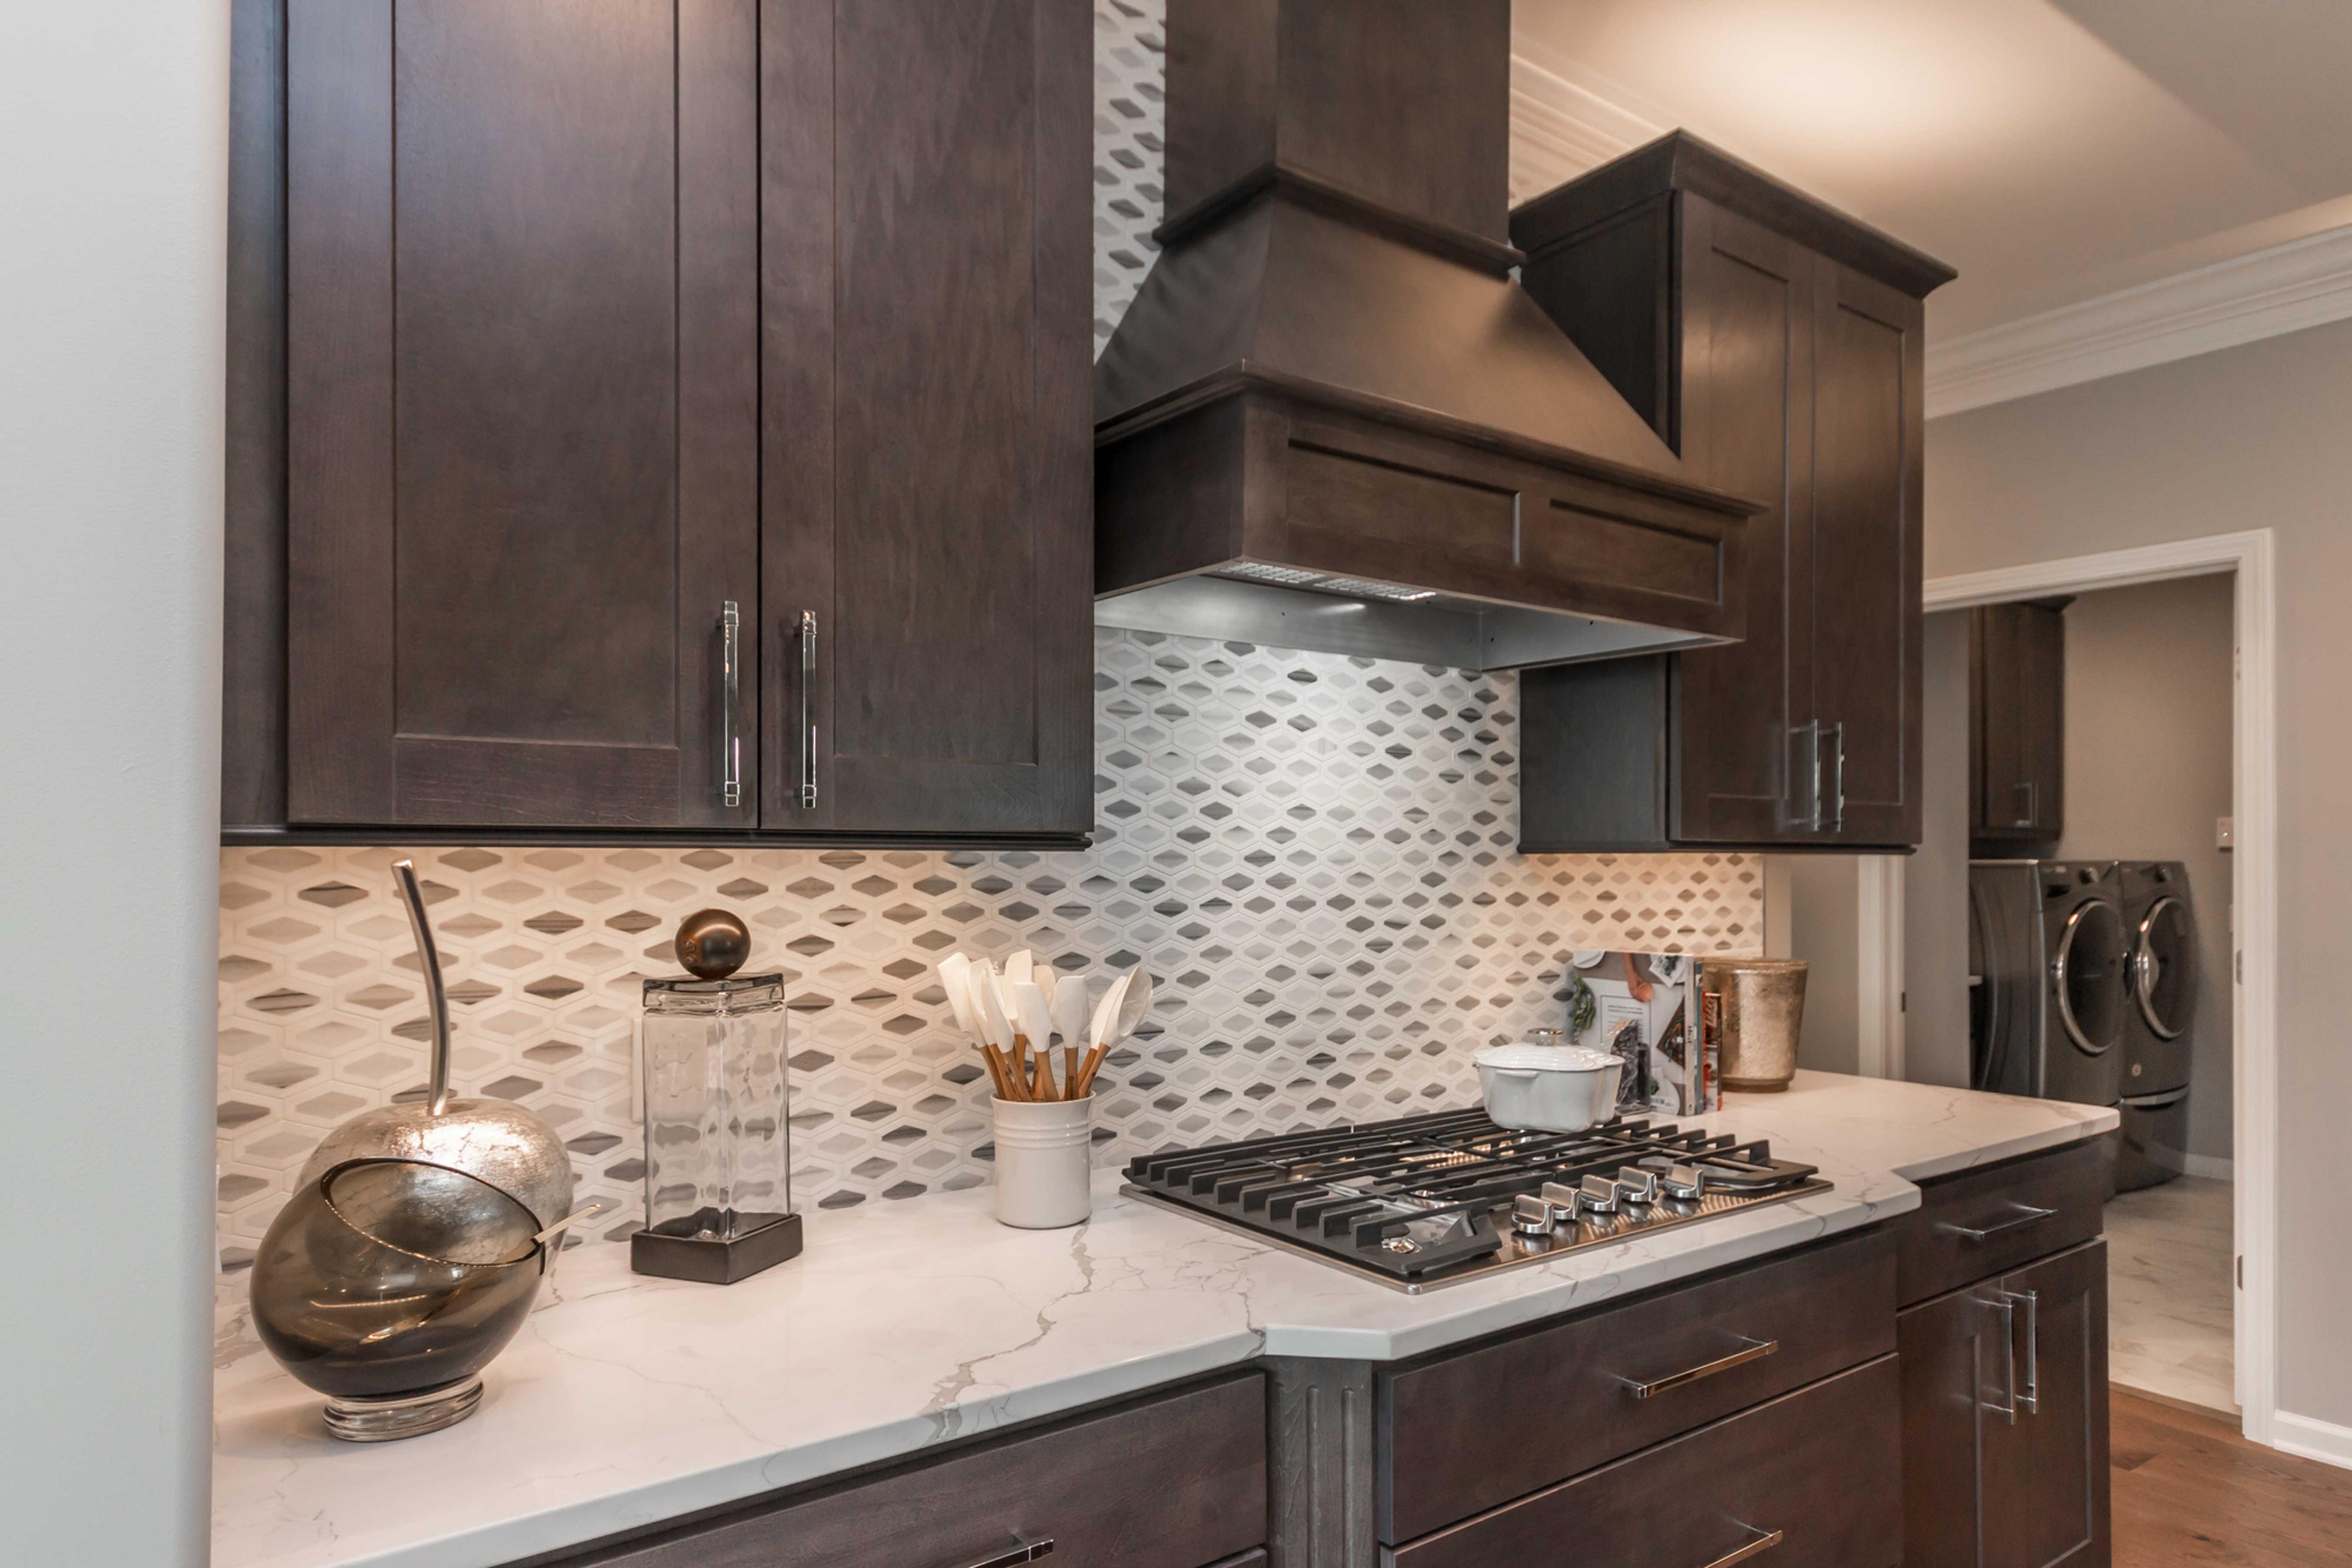 Ten Beautiful Backsplash Designs From Our Recent Home Tours Beautiful Backsplash Backsplash Designs Kitchen Design